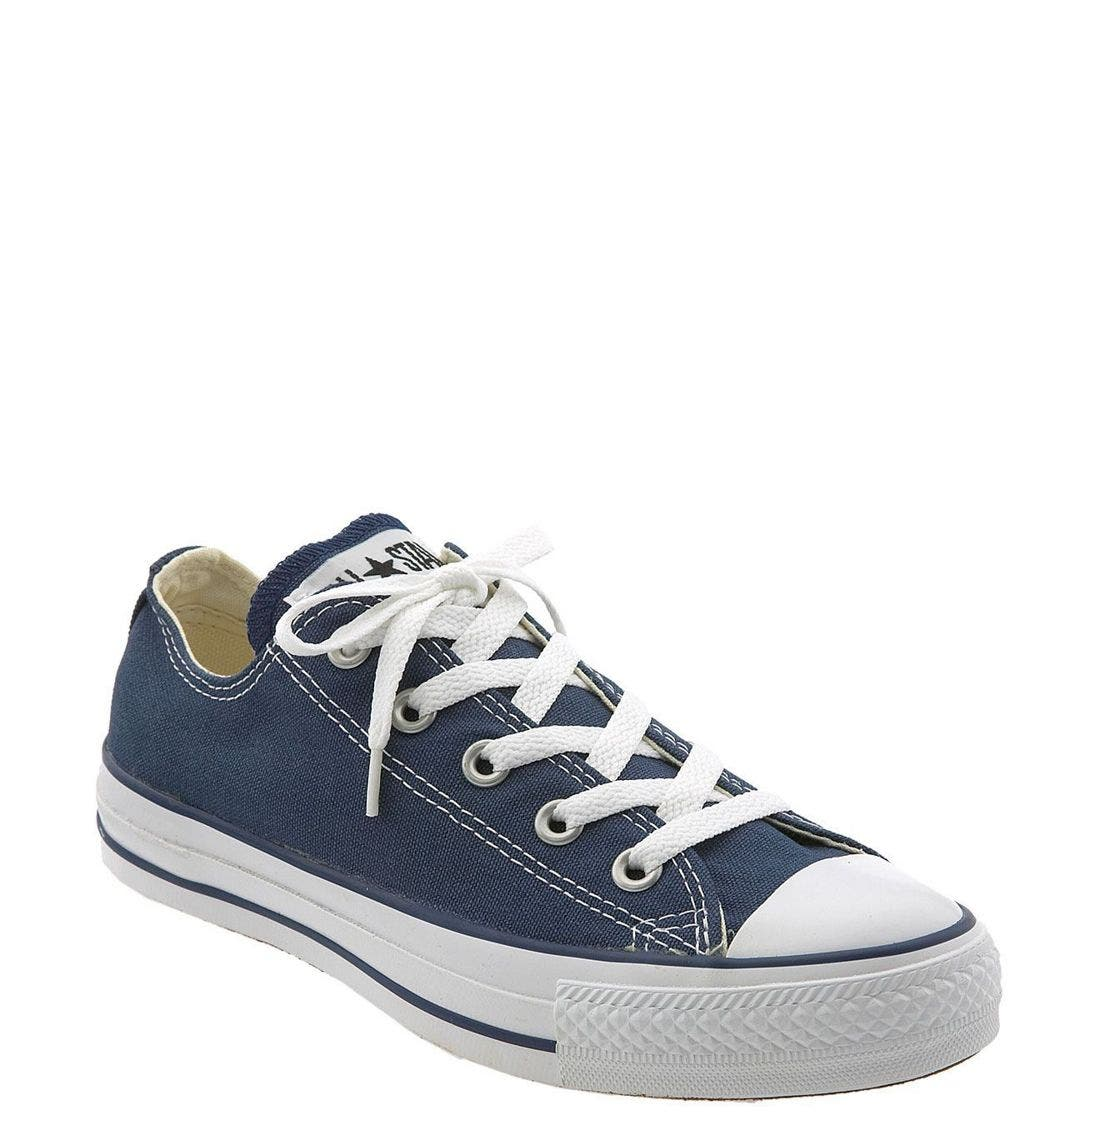 Alternate Image 1 Selected - Converse Chuck Taylor® Low Top Sneaker (Women)